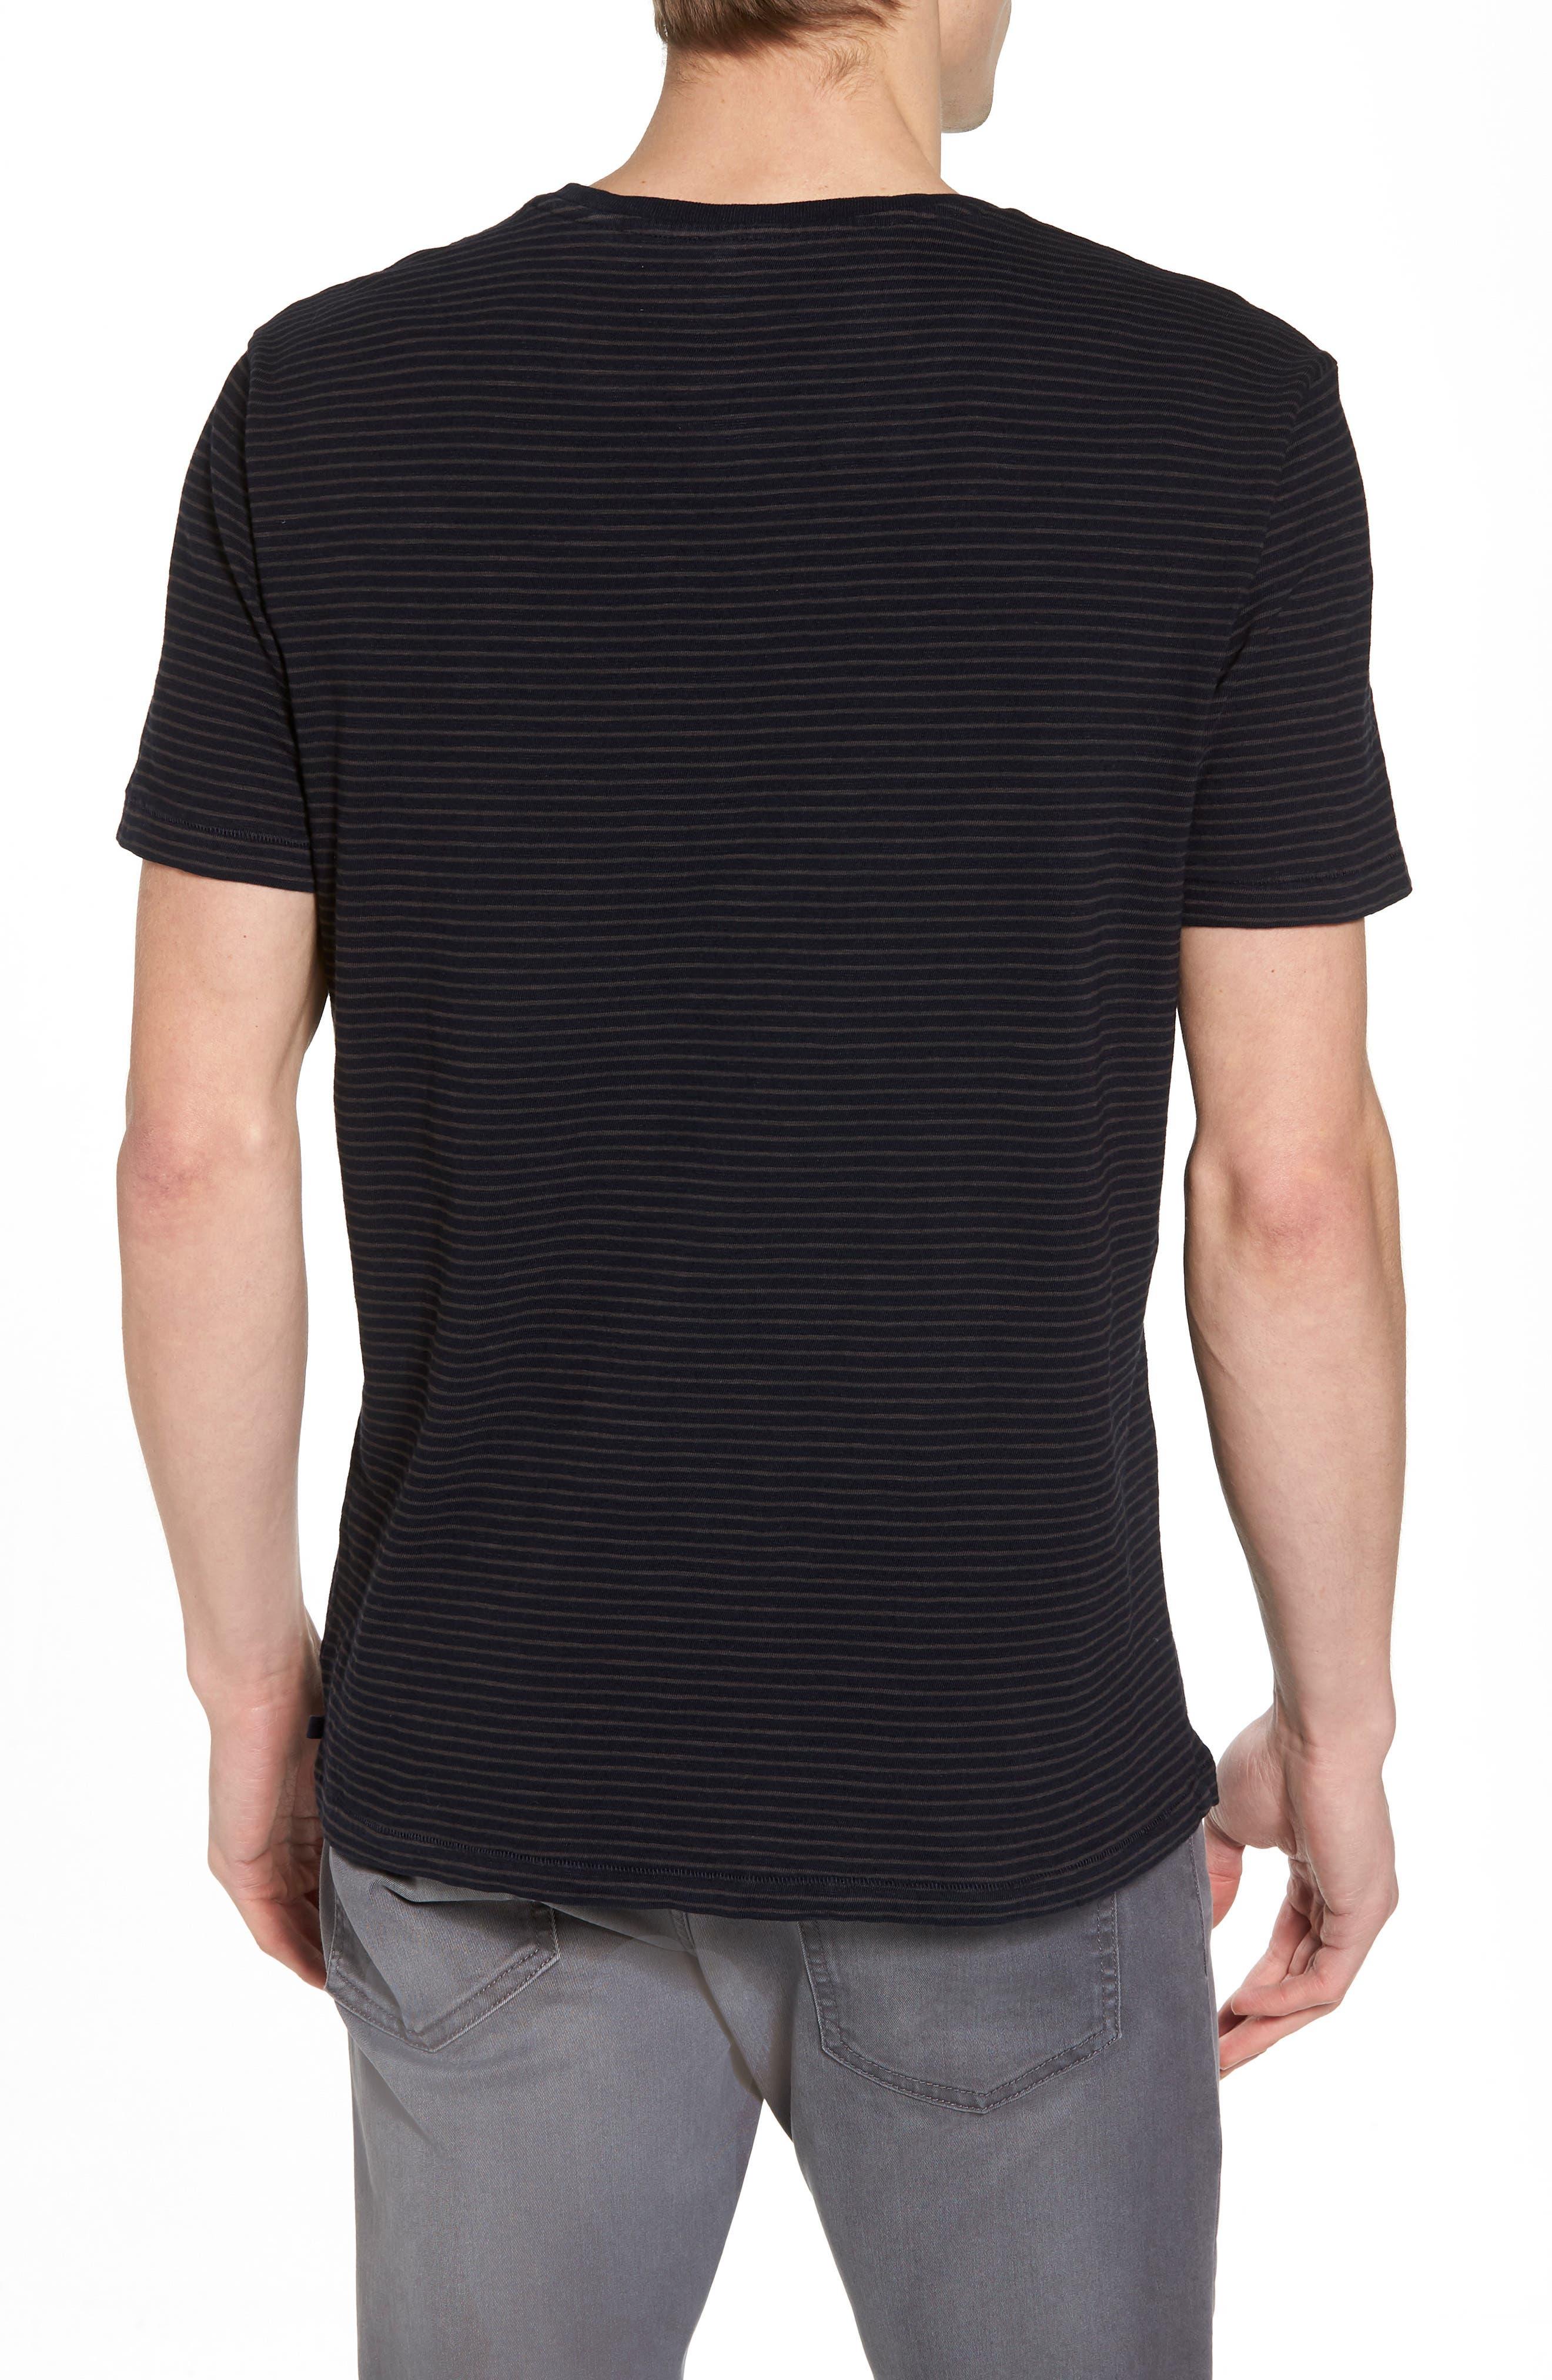 Julian Slim Fit Crewneck Shirt,                             Alternate thumbnail 5, color,